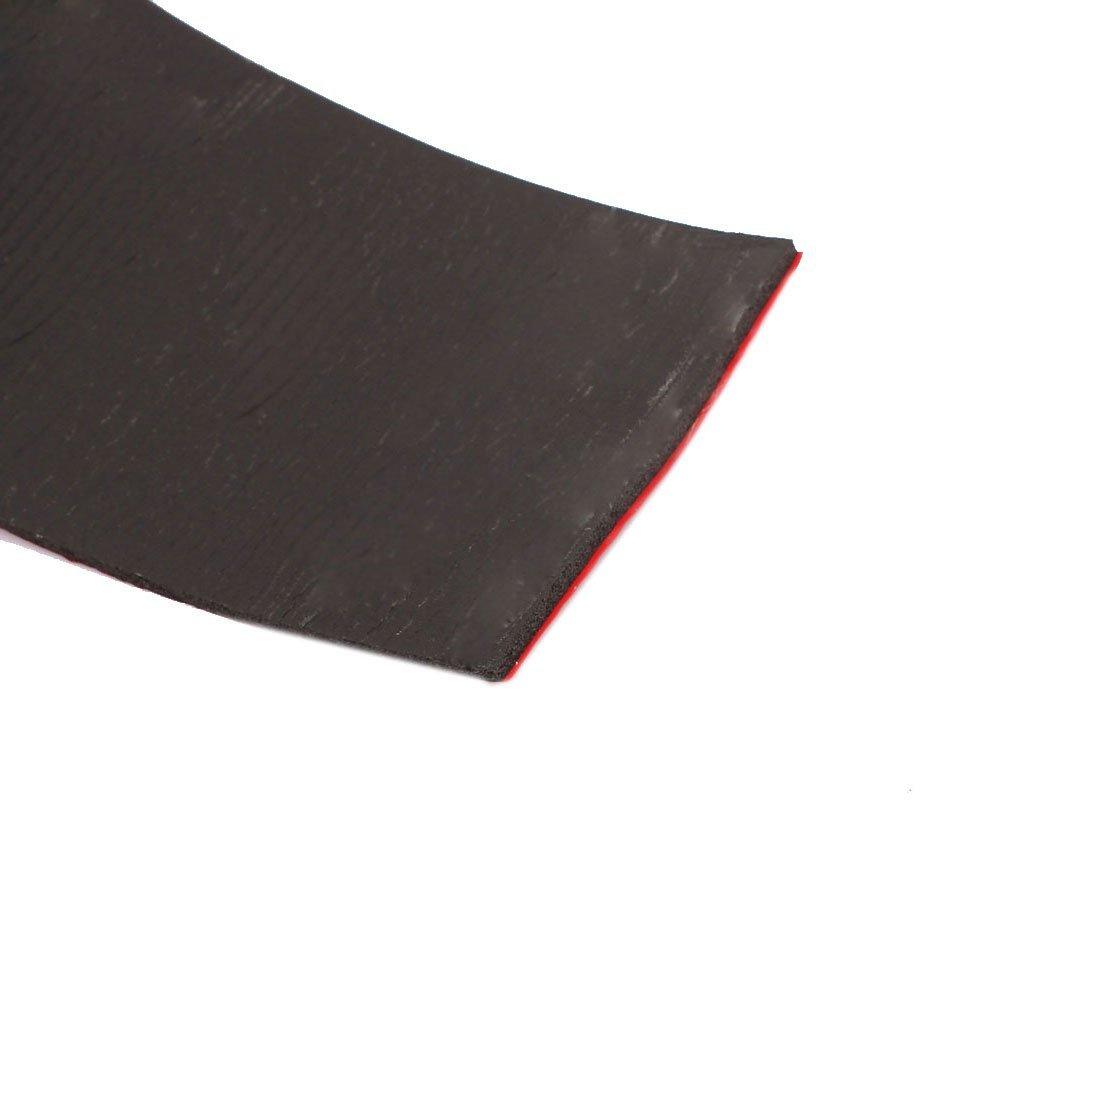 eDealMax 100mm de doble adhesivo lateral choque espuma resistente anti-ruido de la cinta Longitud 4M - - Amazon.com